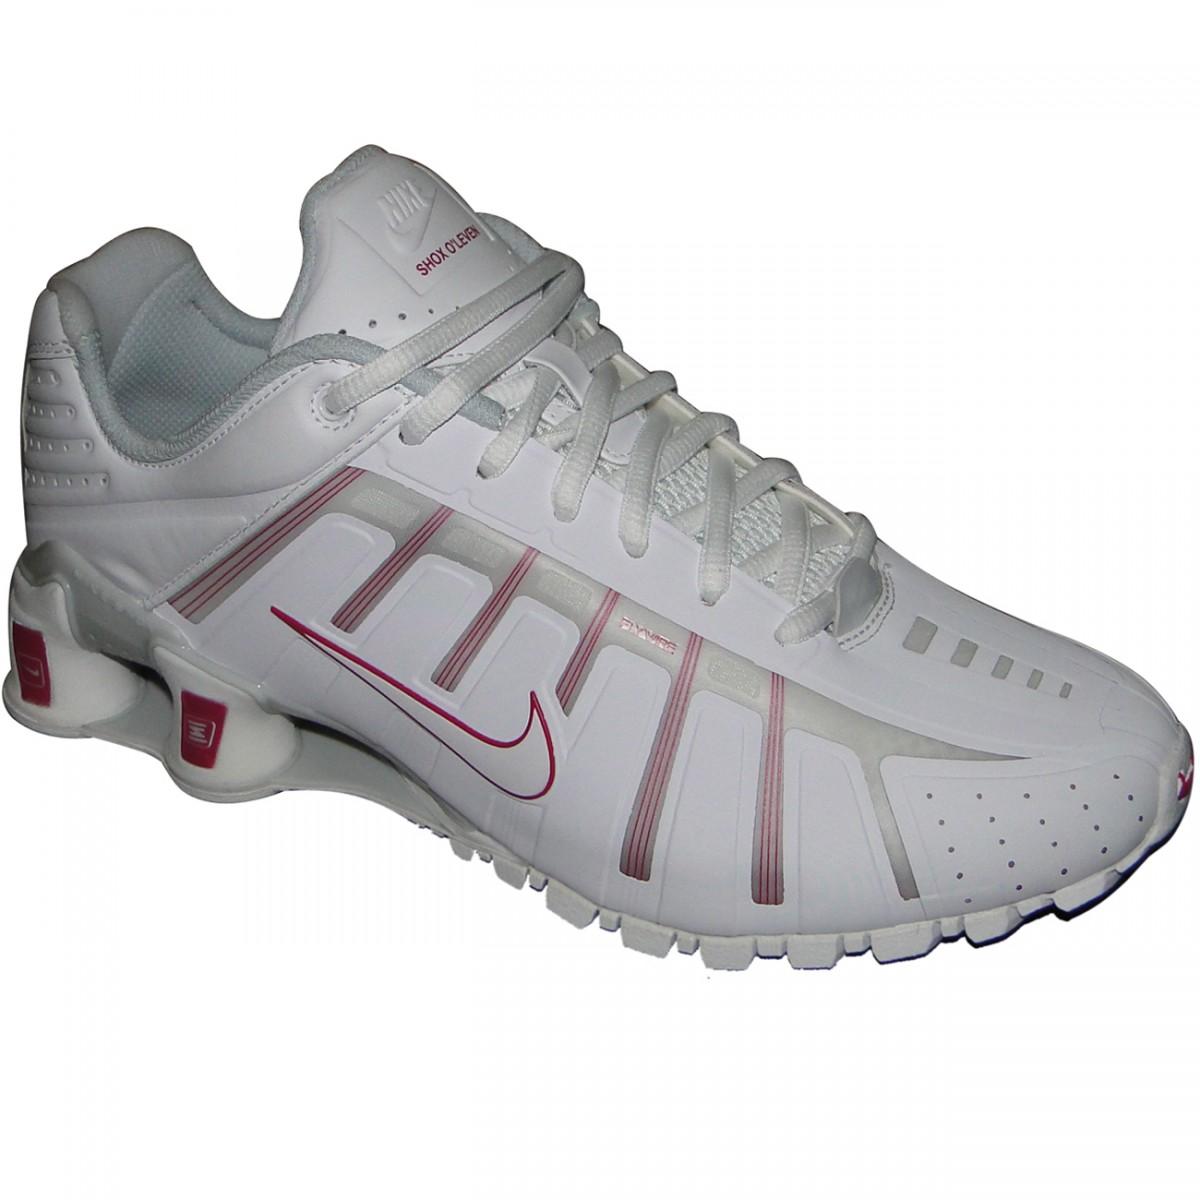 premium selection 4ddfa 8b650 Tênis Nike Shox O leven 429868105 - BRANCO LILAS - Chuteira Nike, Adidas.  Sandalias Femininas. Sandy Calçados